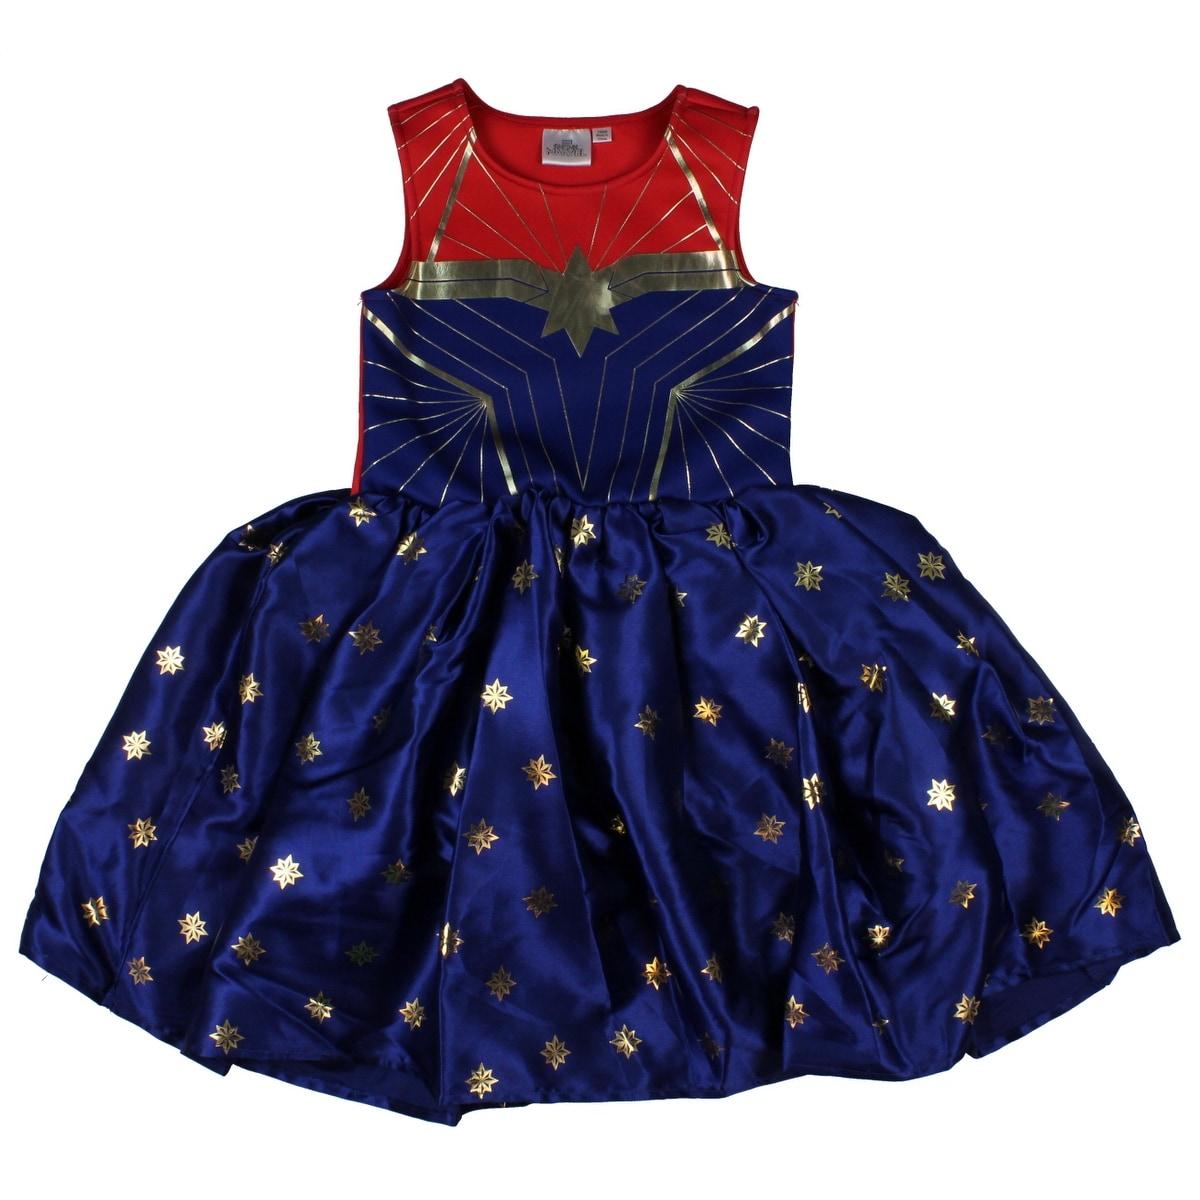 Shop Marvel Captain Marvel Little Girl S Superhero Costume Dress Overstock 31621046 Target/holiday shop/captain marvel costume (3291). overstock com